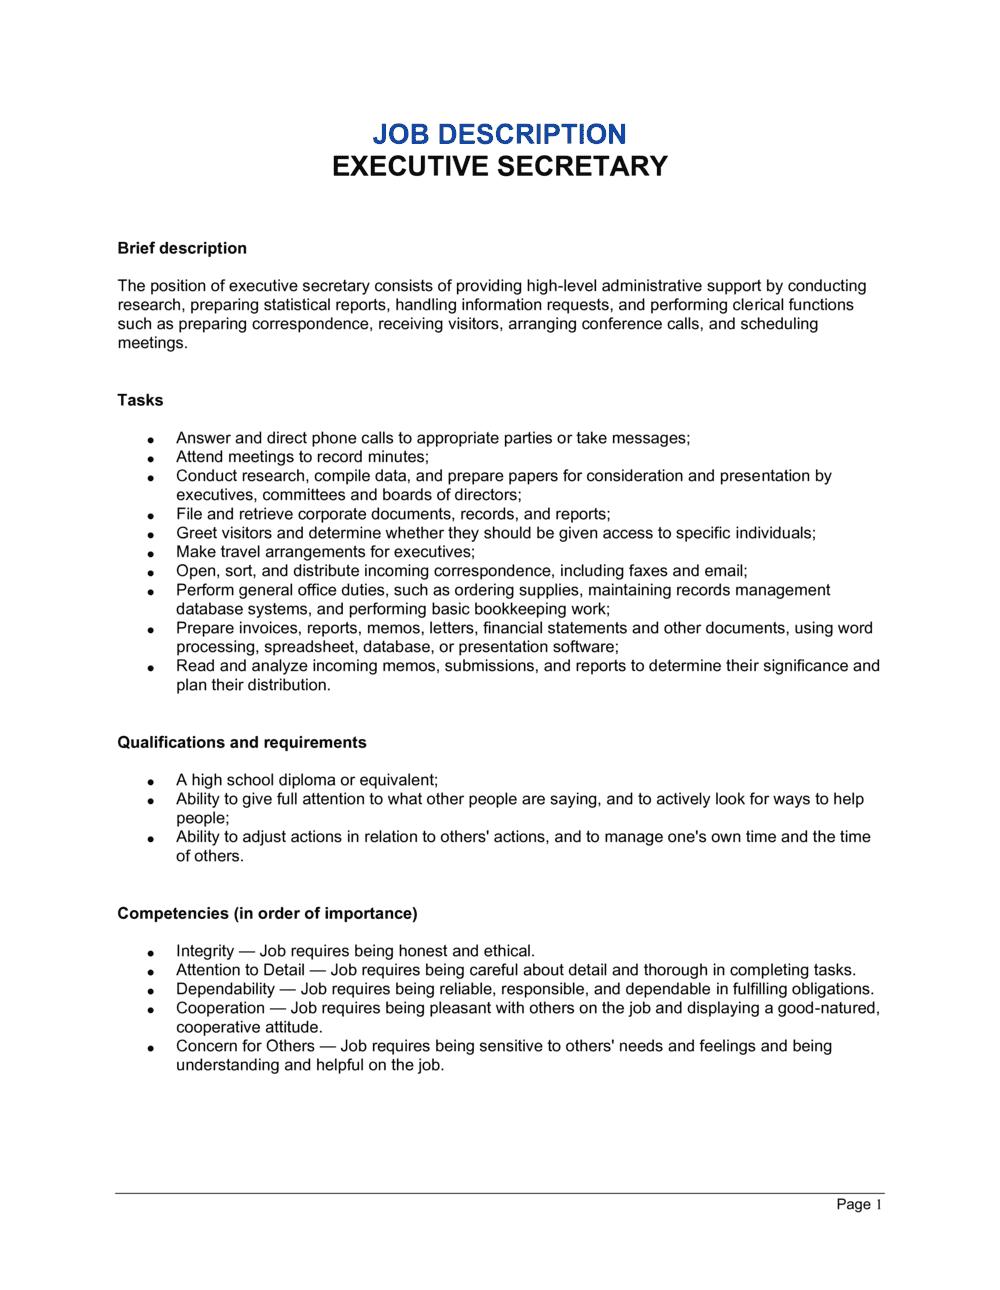 Business-in-a-Box's Executive Secretary Job Description Template